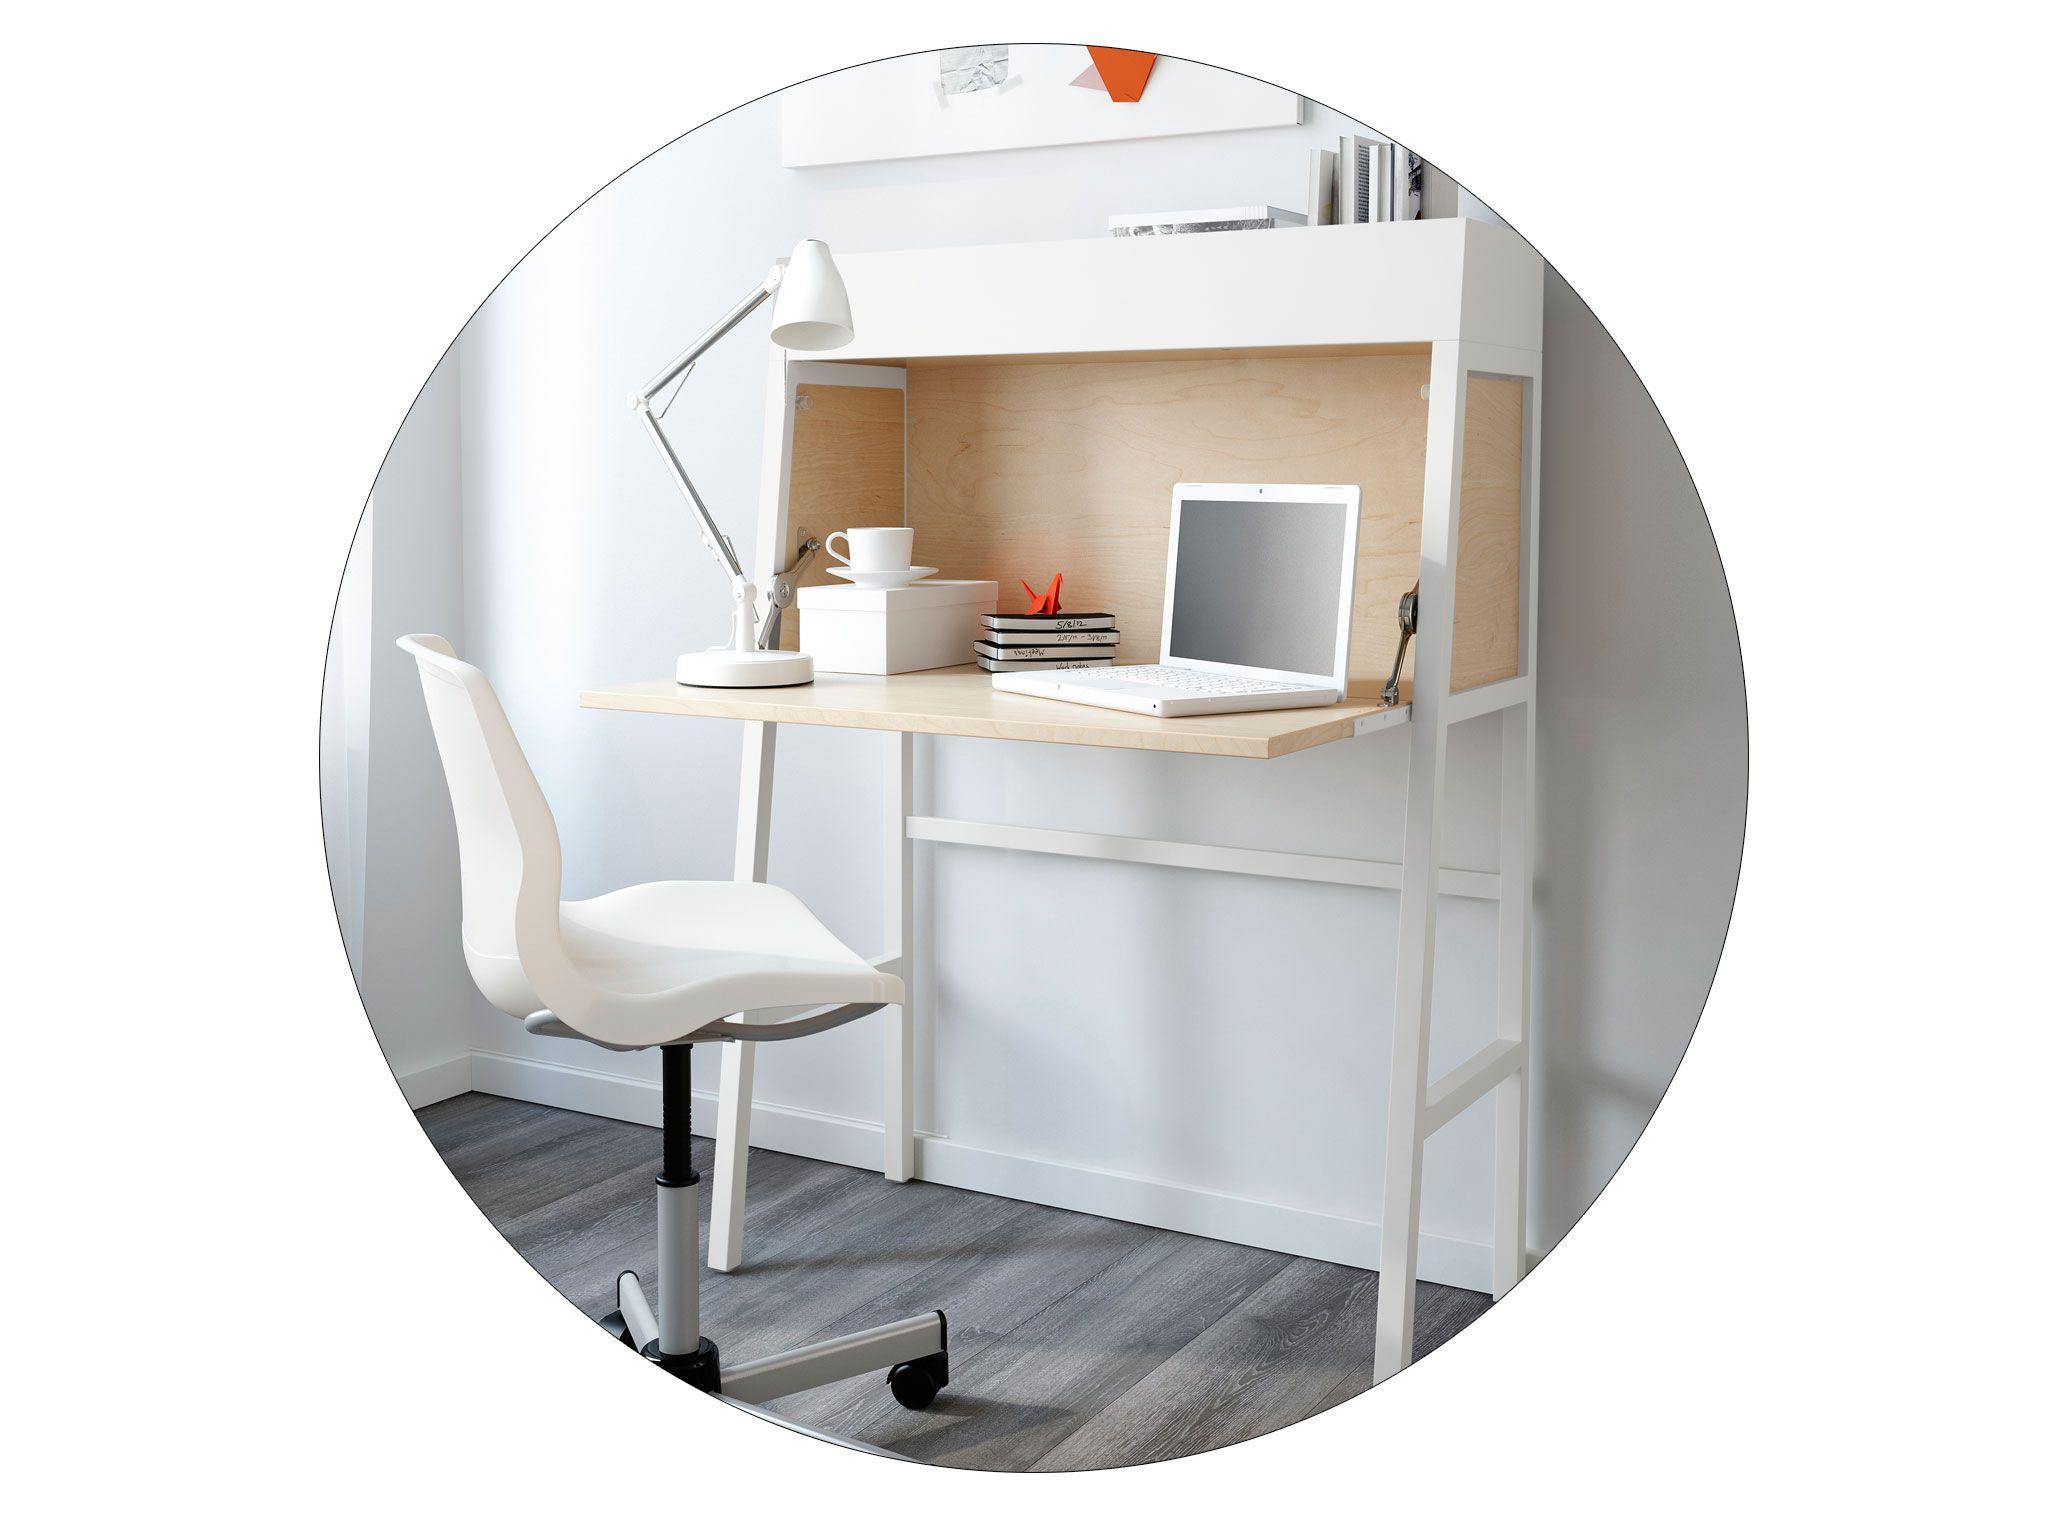 Ps 2014 bureau white birch veneer 90 x 127 cm in 2018 interior